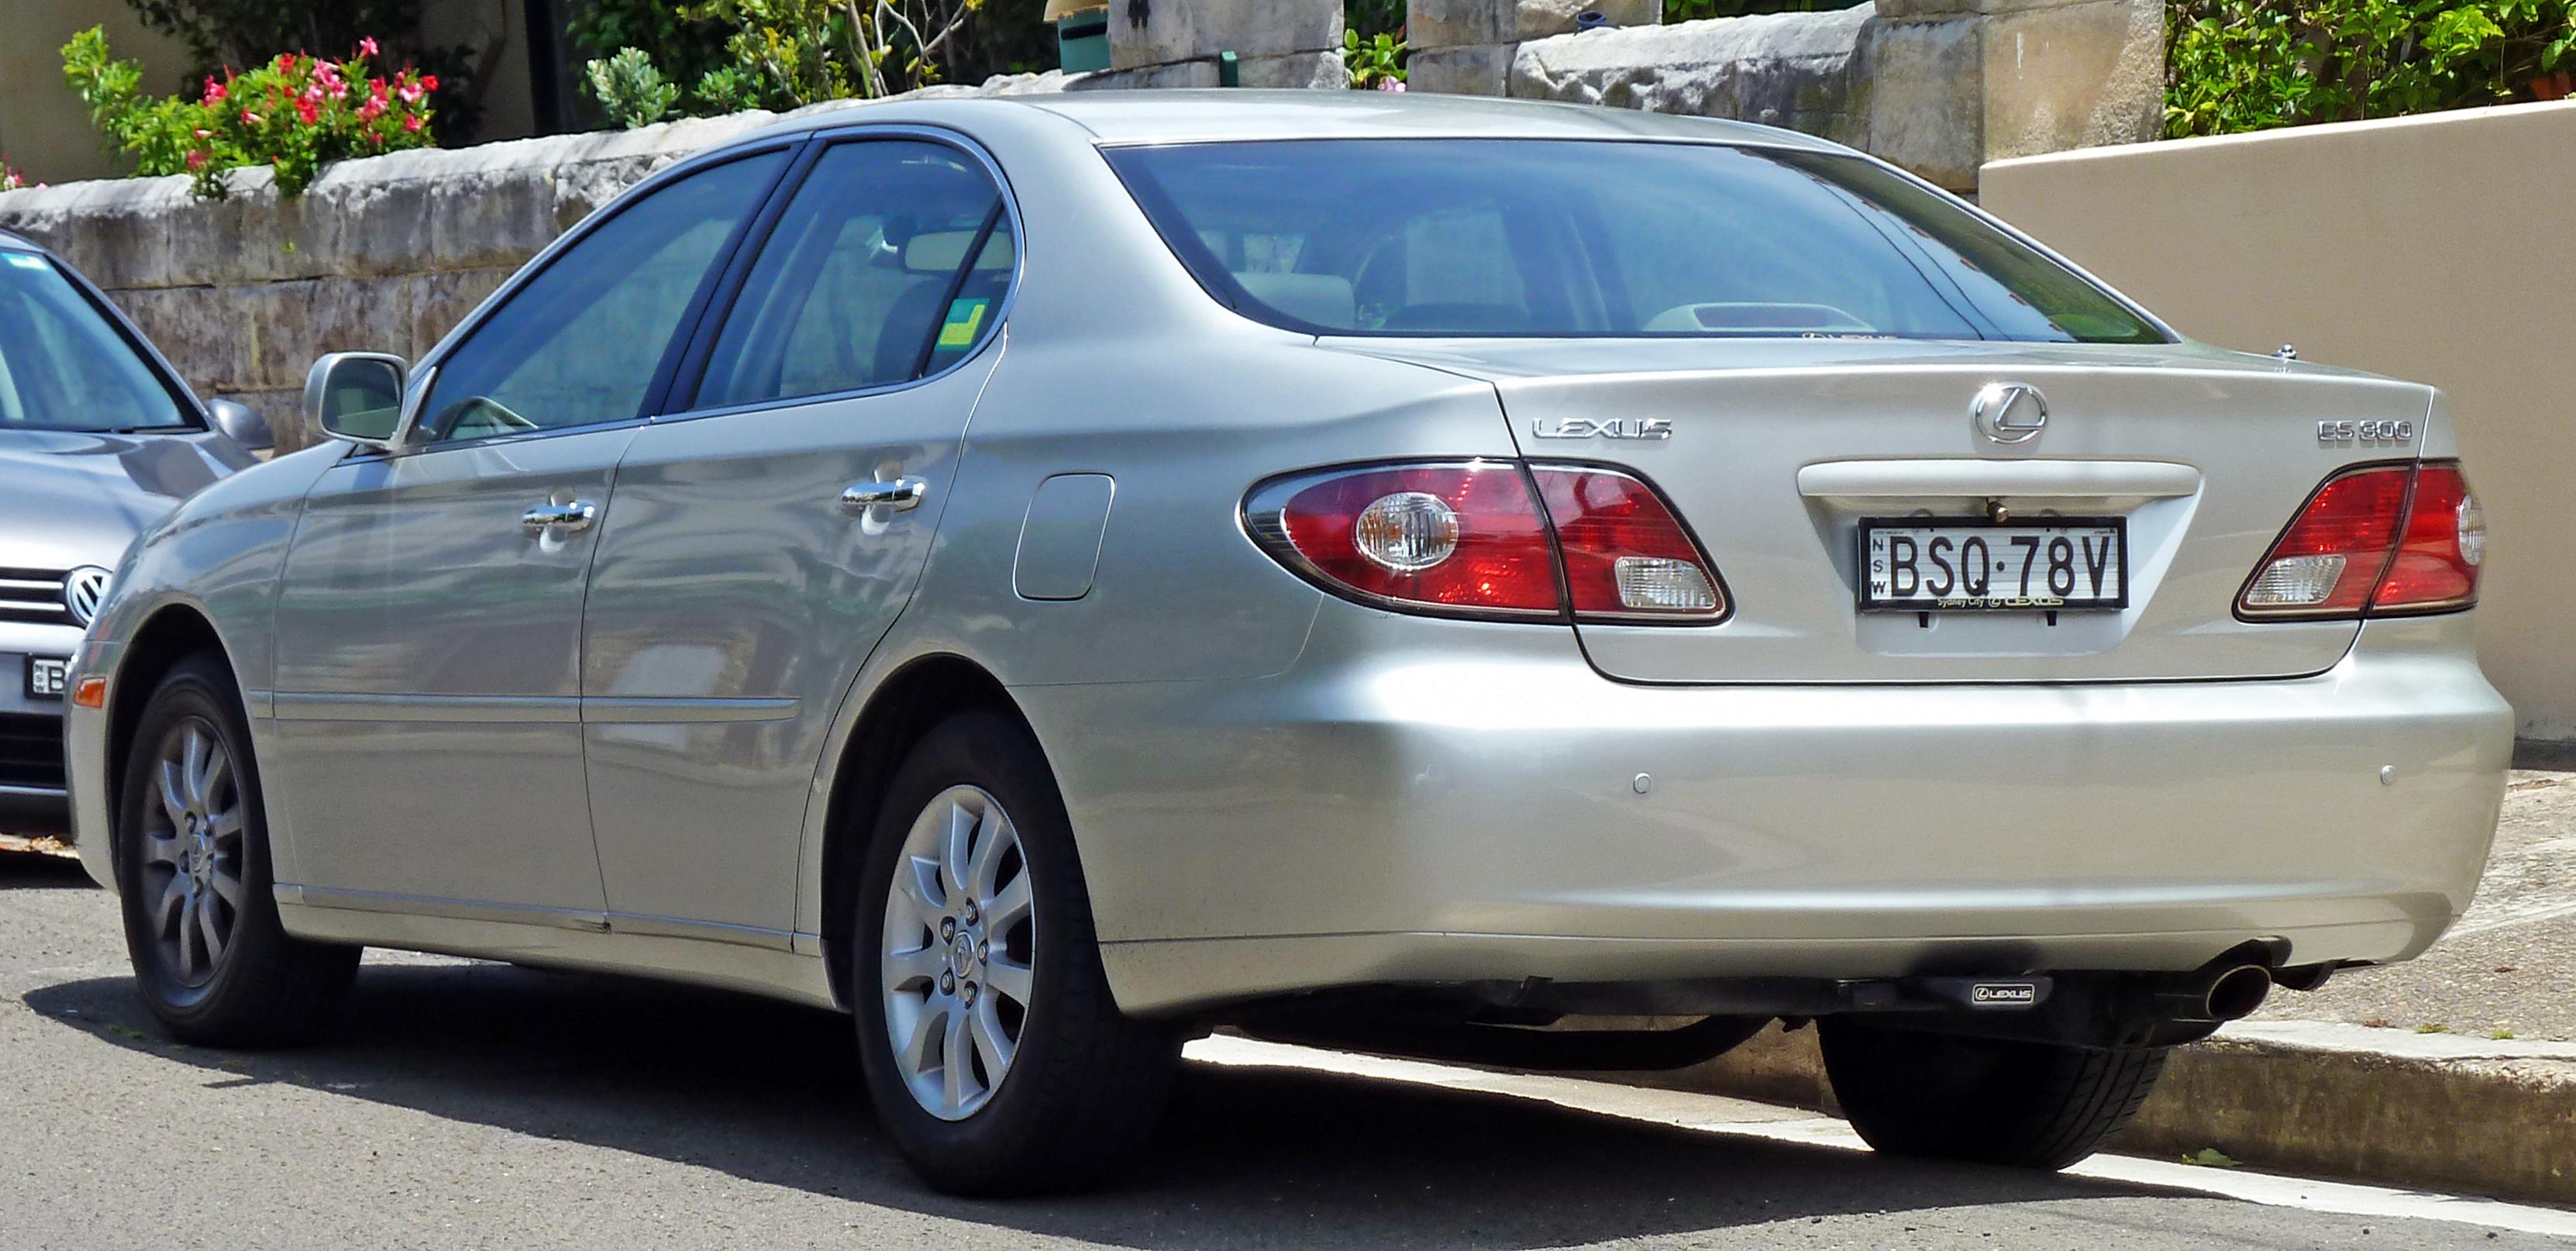 File 2003 Lexus ES 300 MCV30R sedan 2011 01 05 Wikimedia